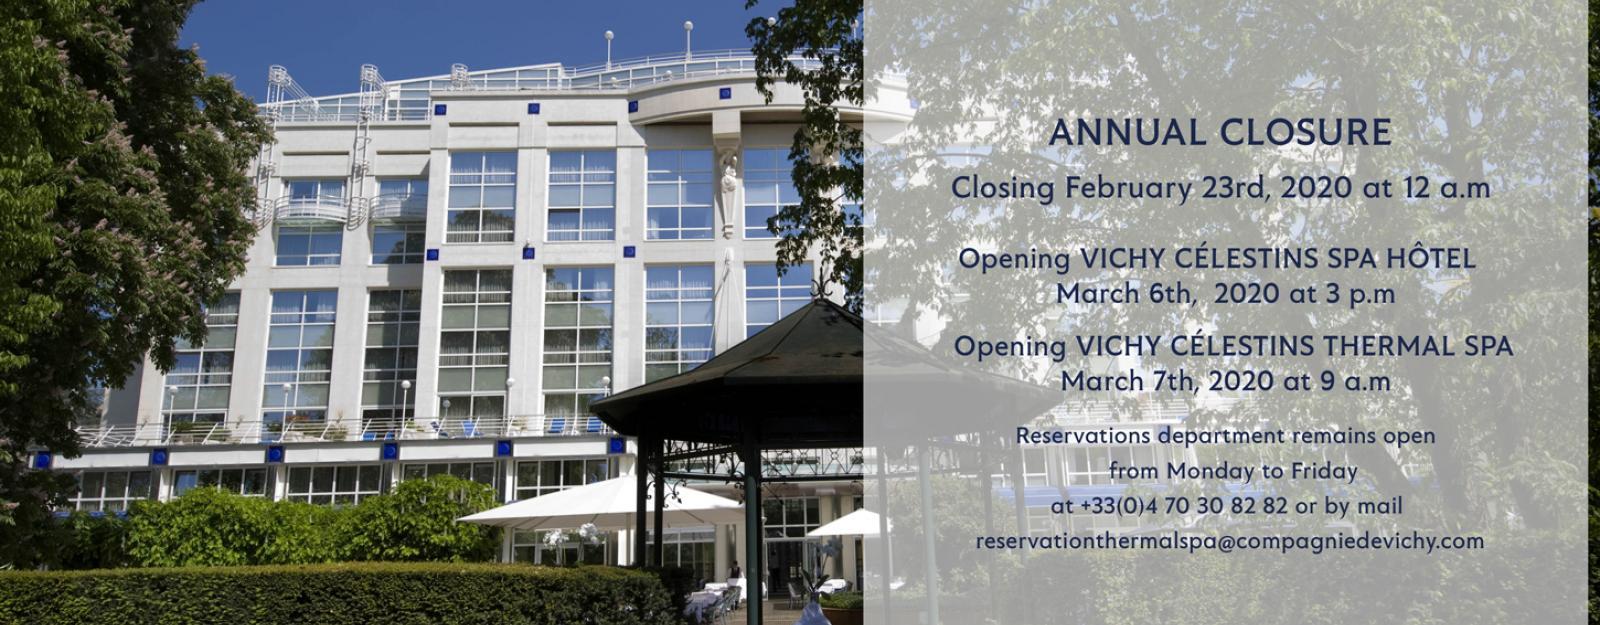 Annual closure 2020